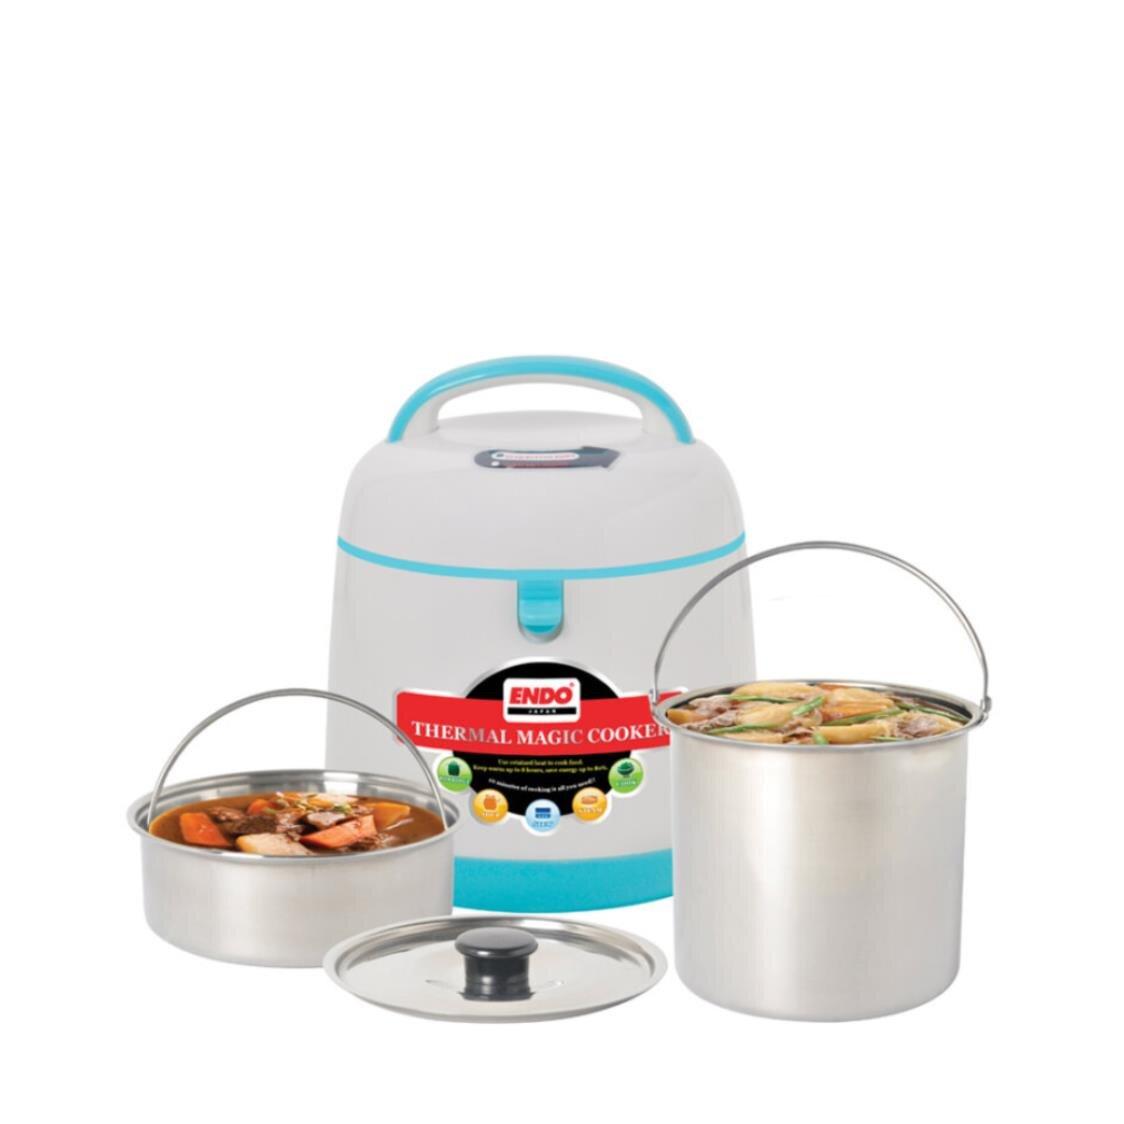 Endo 18L Thermal Magic Cooker